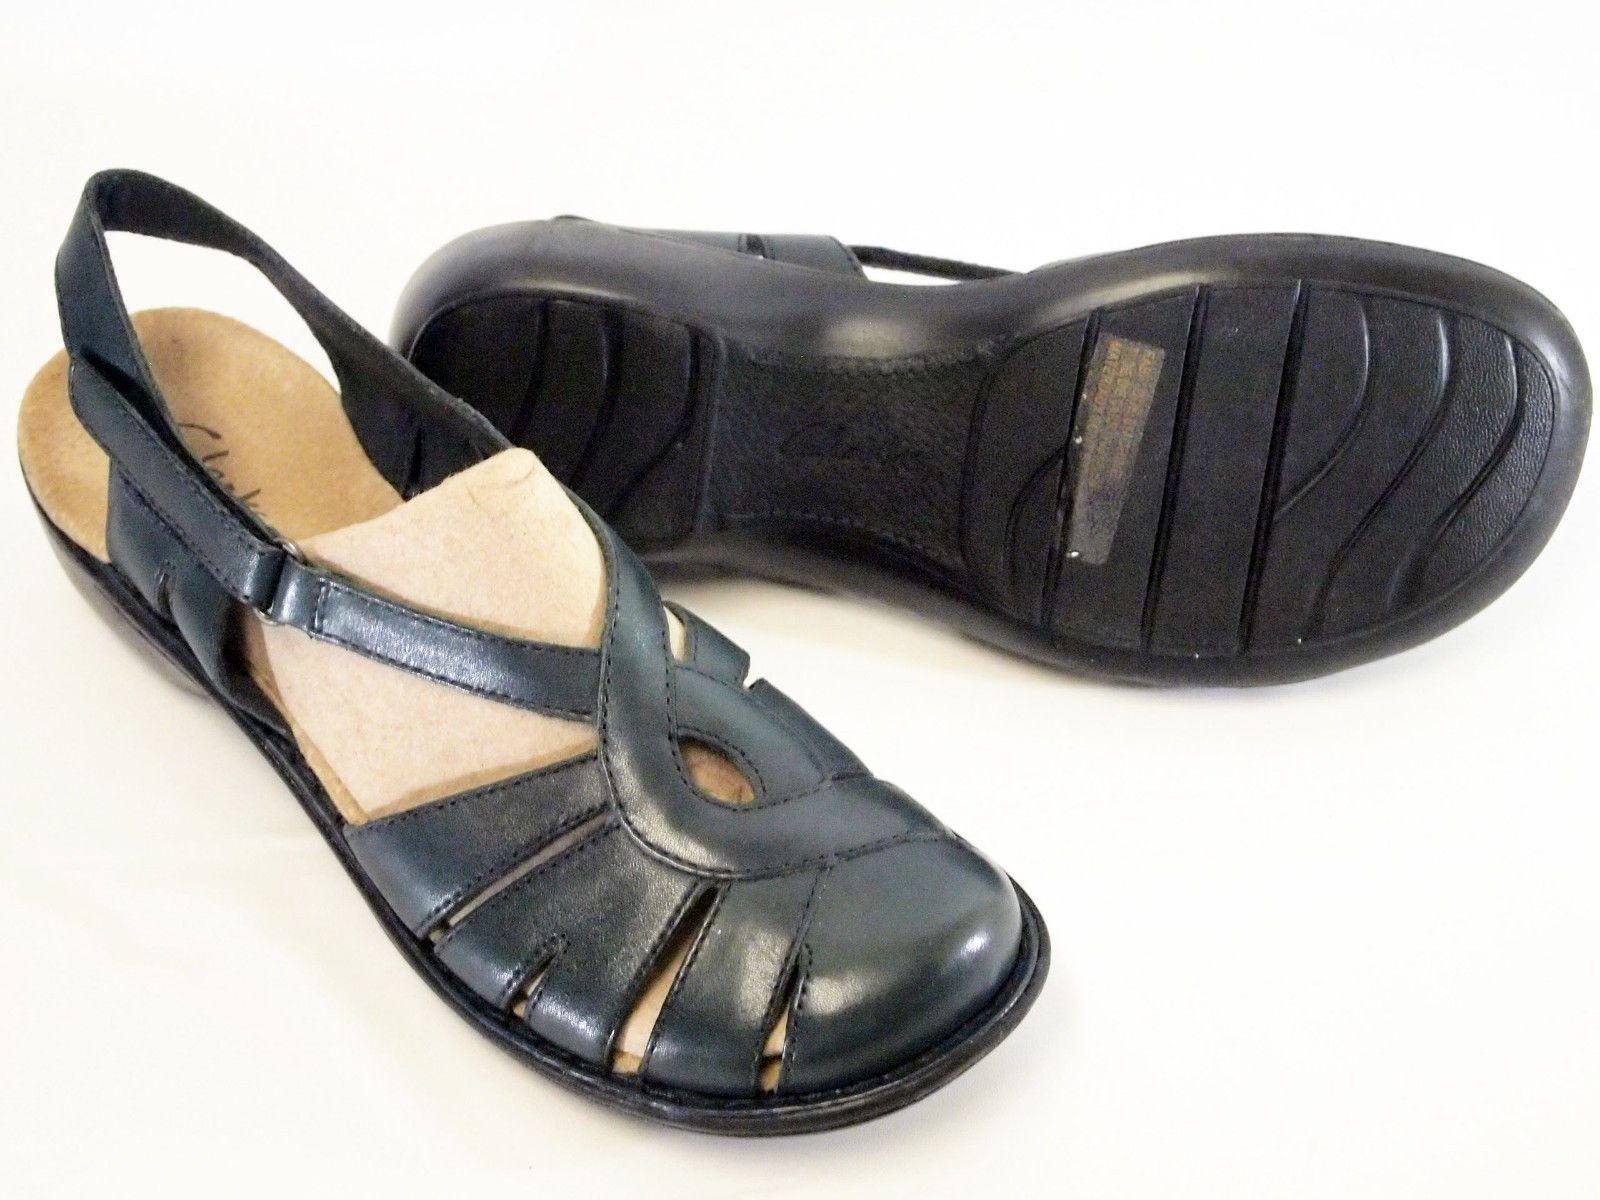 Black enclosed sandals - Clarks Bendables Marble Blue Slingback Closed Toe Sandals 37374 Womens Size 9 5